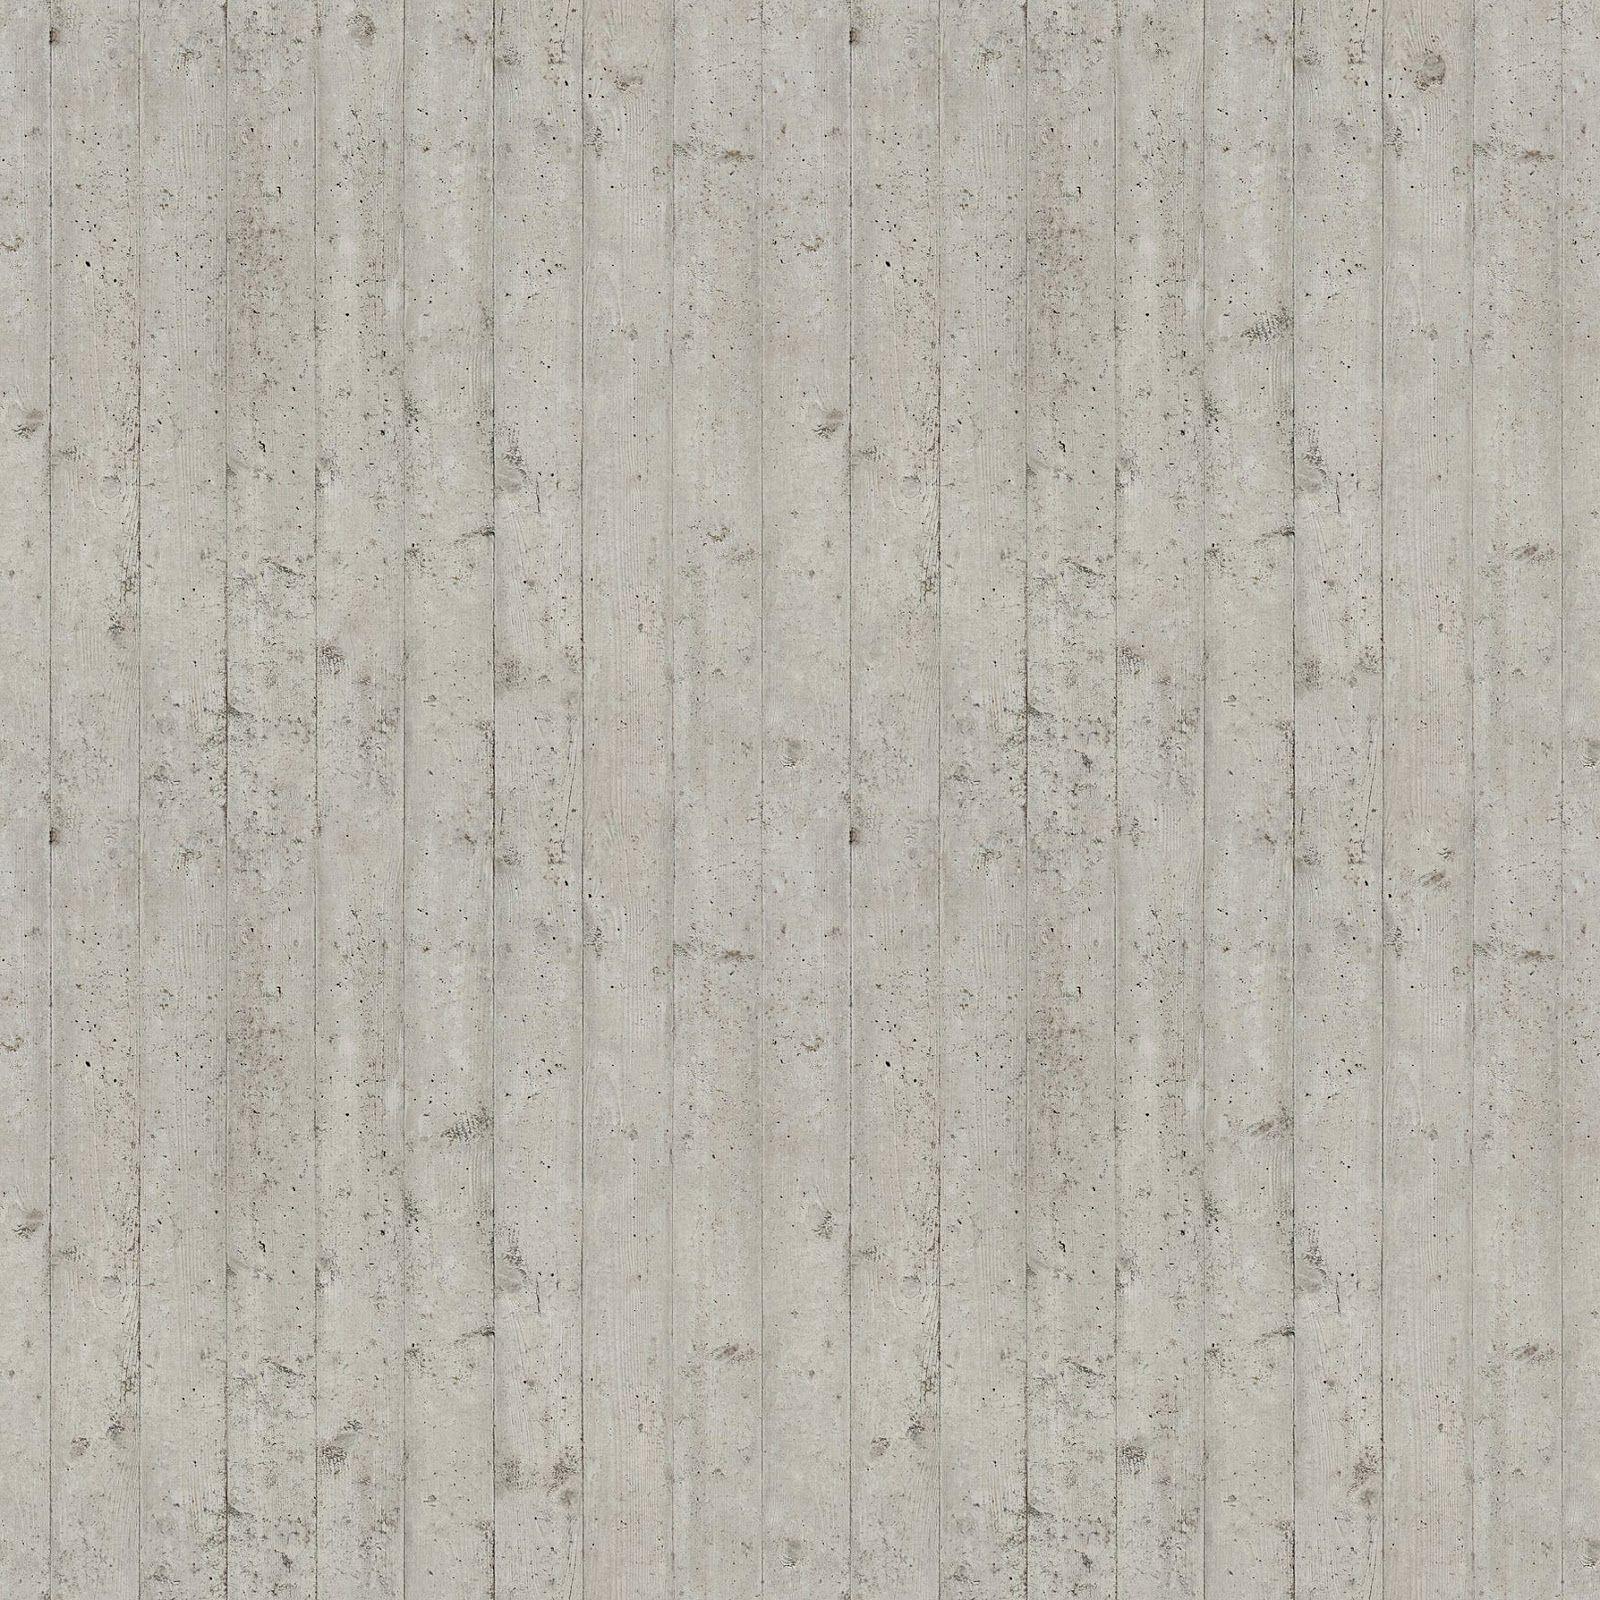 Seamless Concrete Boards Shuttering Texture Maps Texture Texture Mapping Concrete Texture